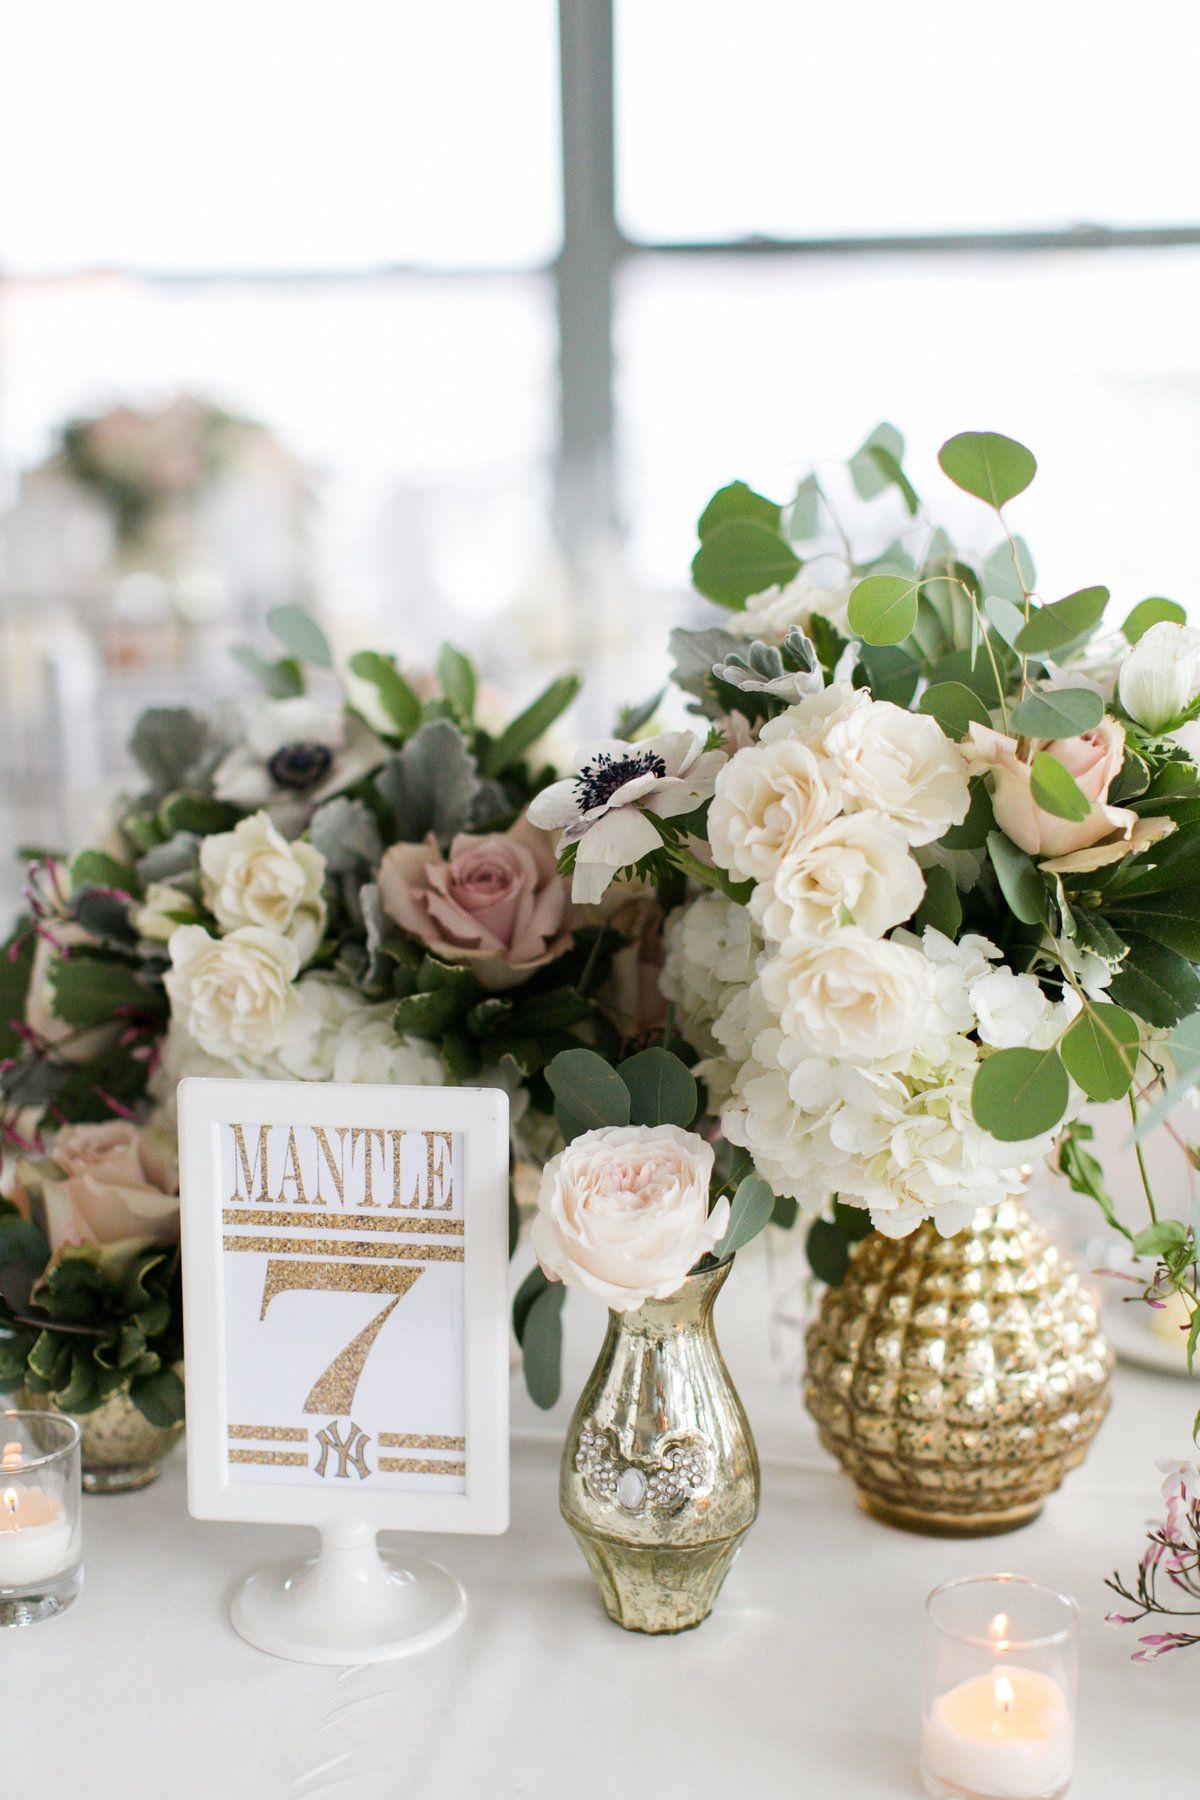 kristen and tom wedding low centerpiece ivory and blush garden roses greenery - Blush Garden Rose Bouquet